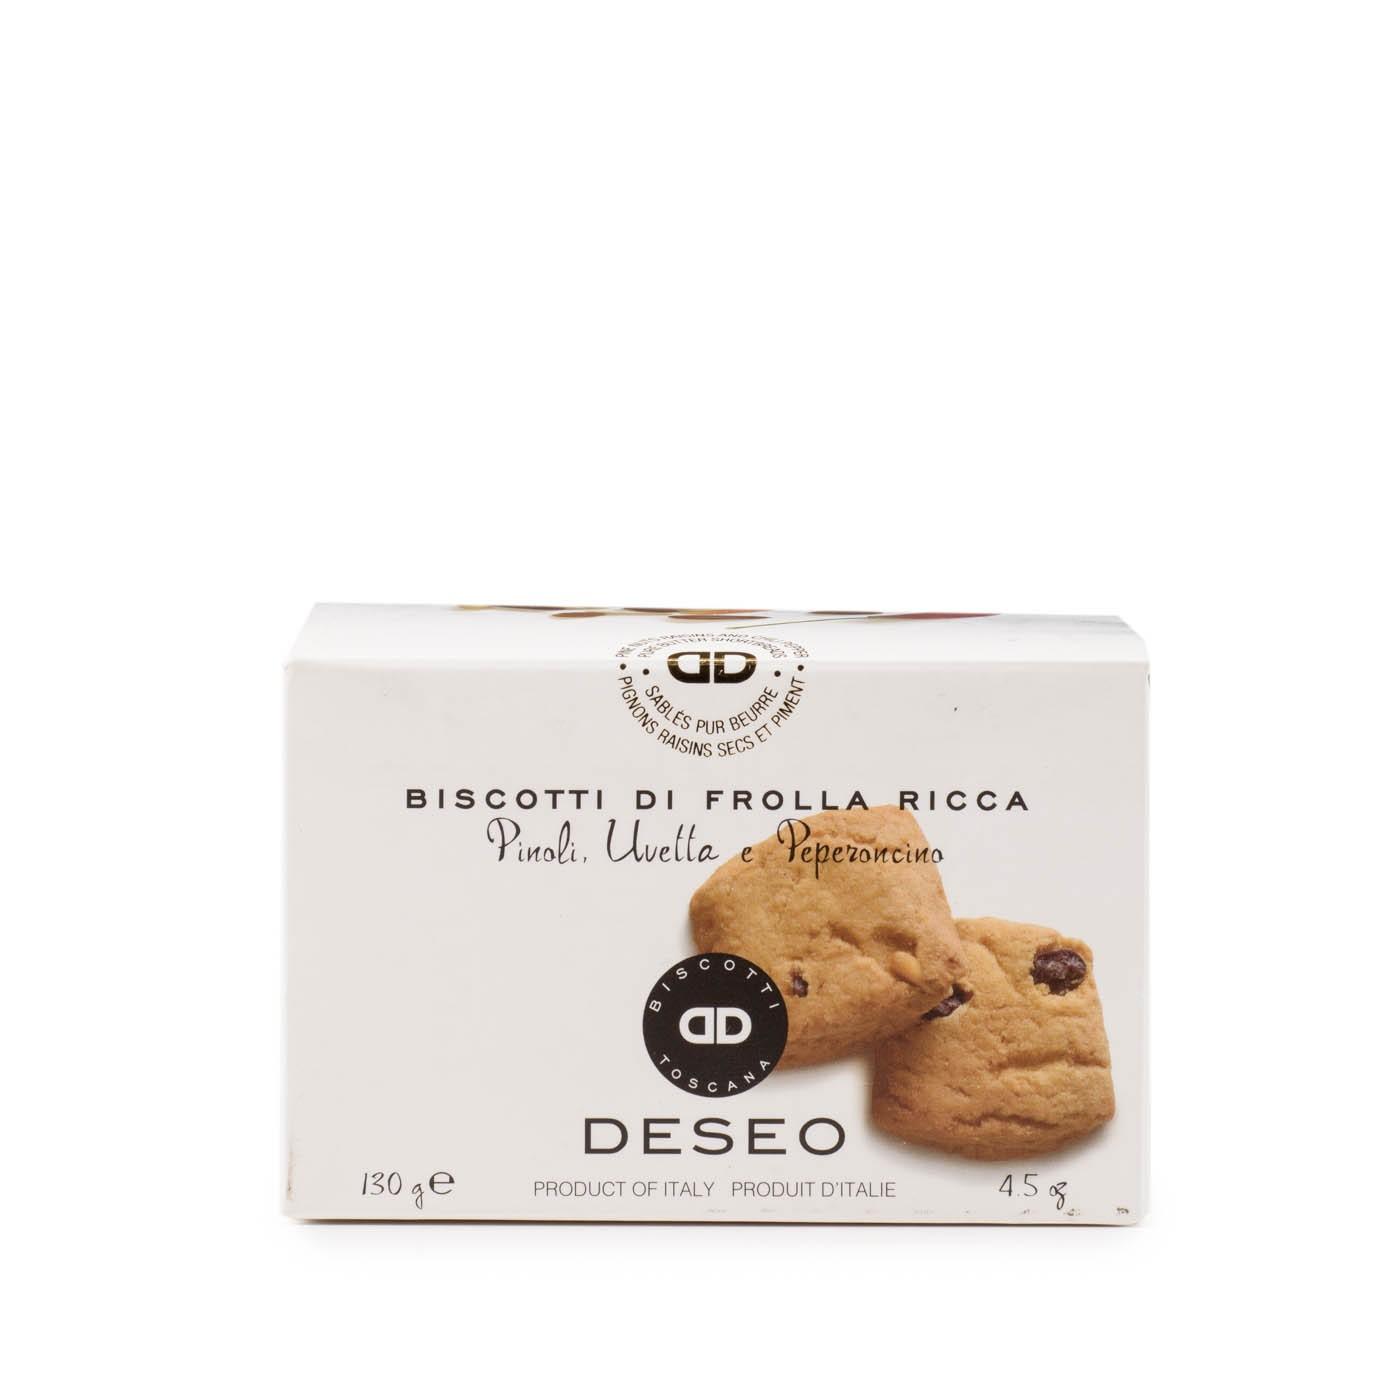 Spicy Raisin Cookies 4.58 oz